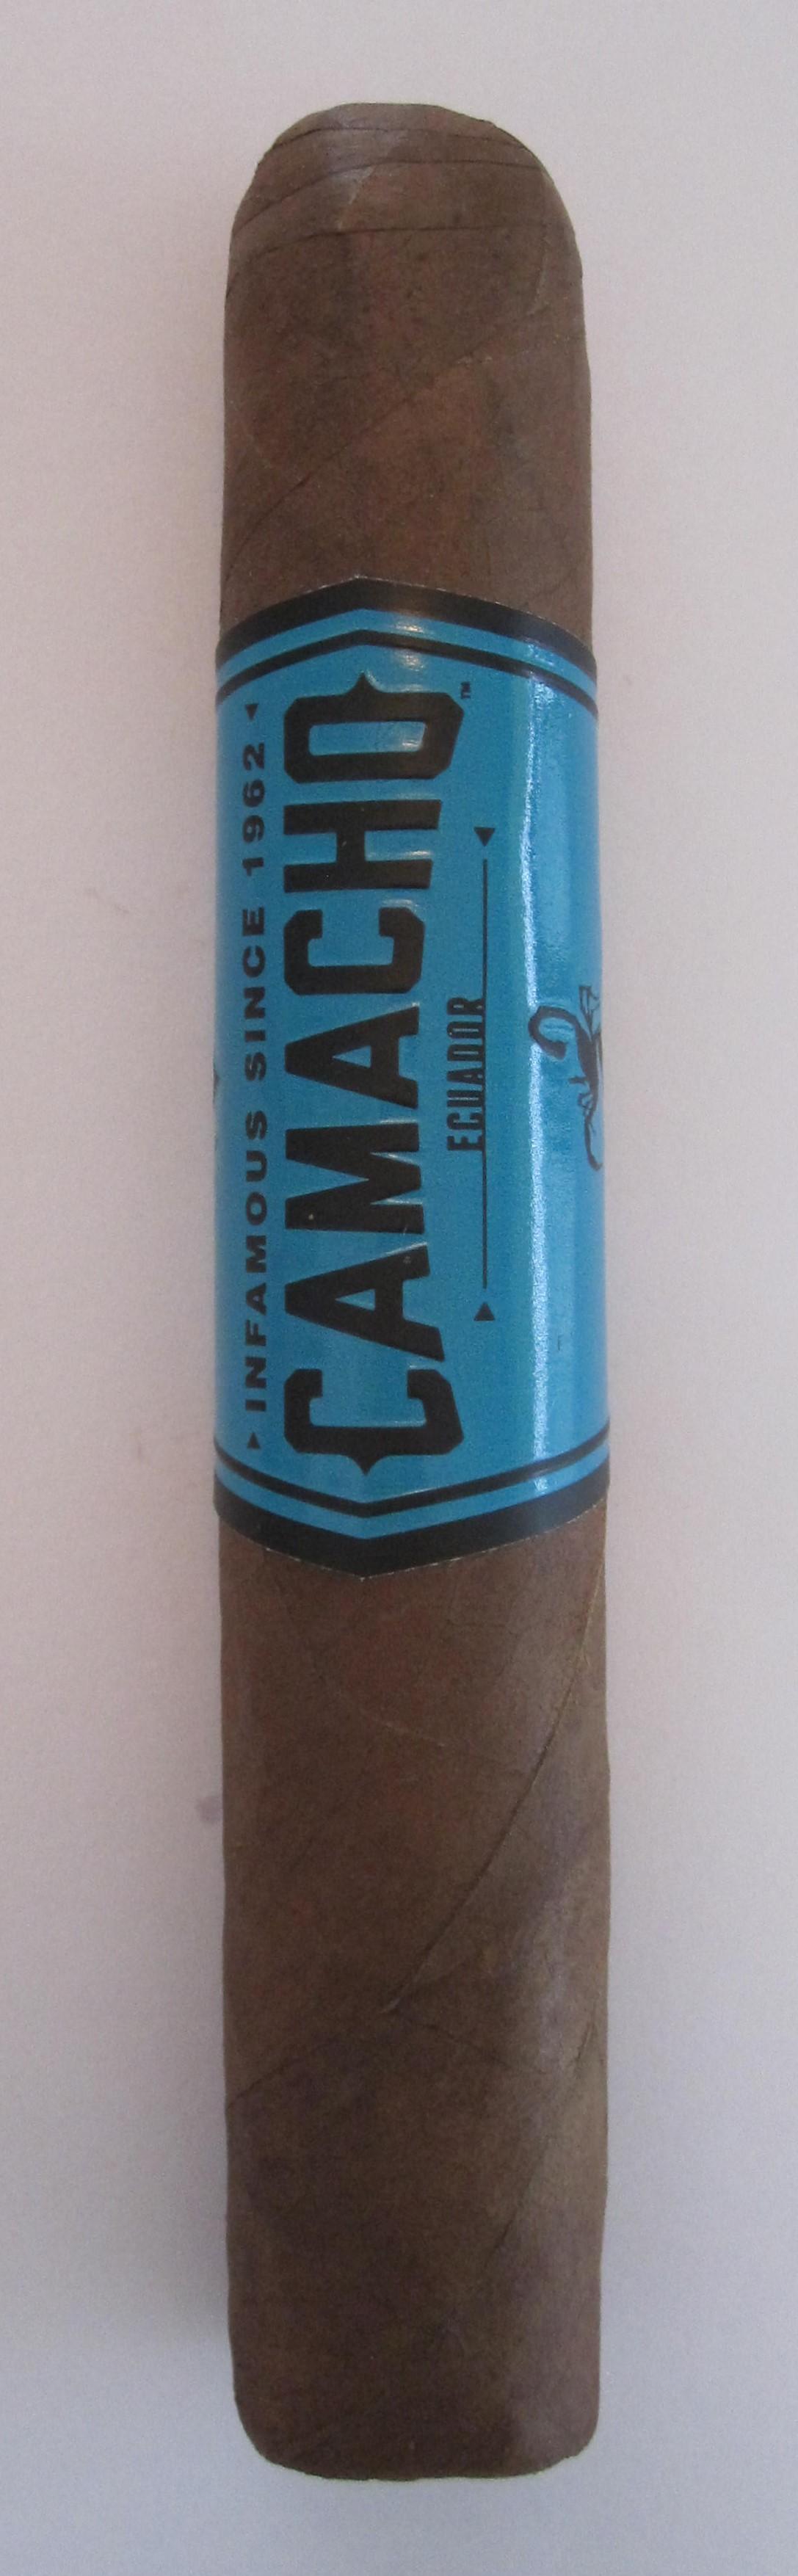 Camacho Ecuador Cigar